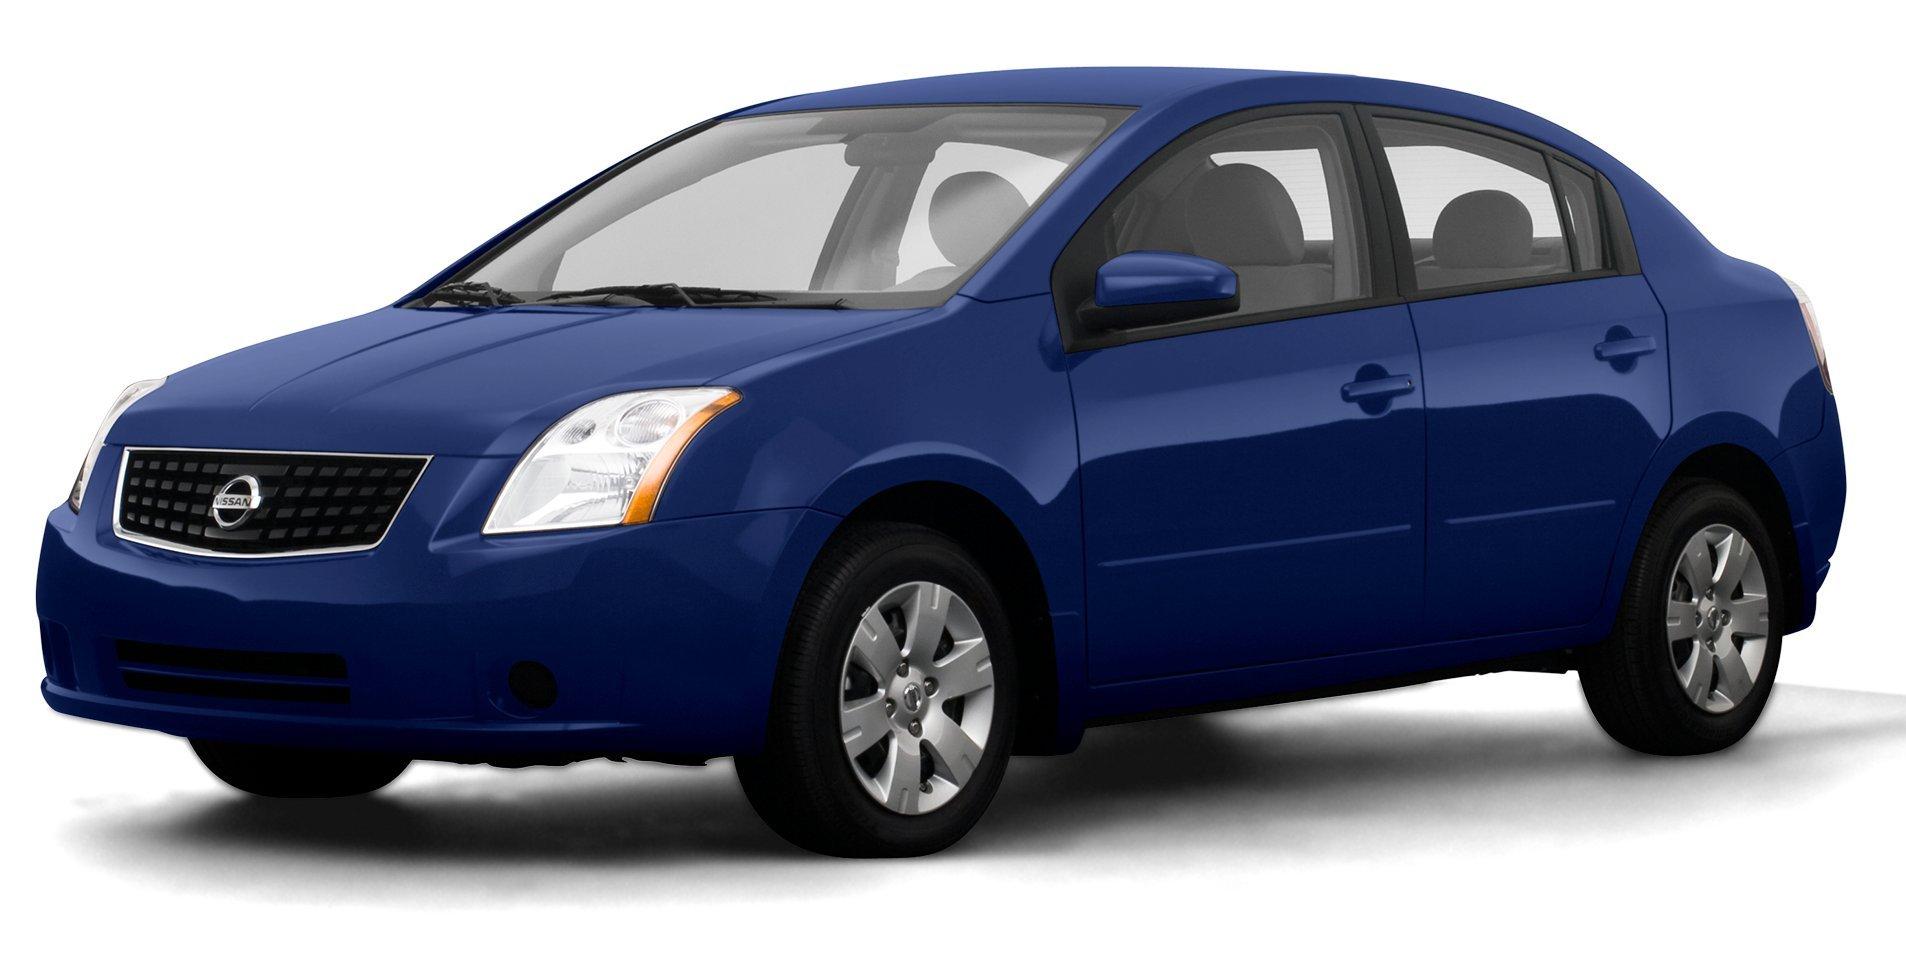 2008 Nissan Sentra 2.0, 4-Door Sedan 4-Cylinder CVT ...